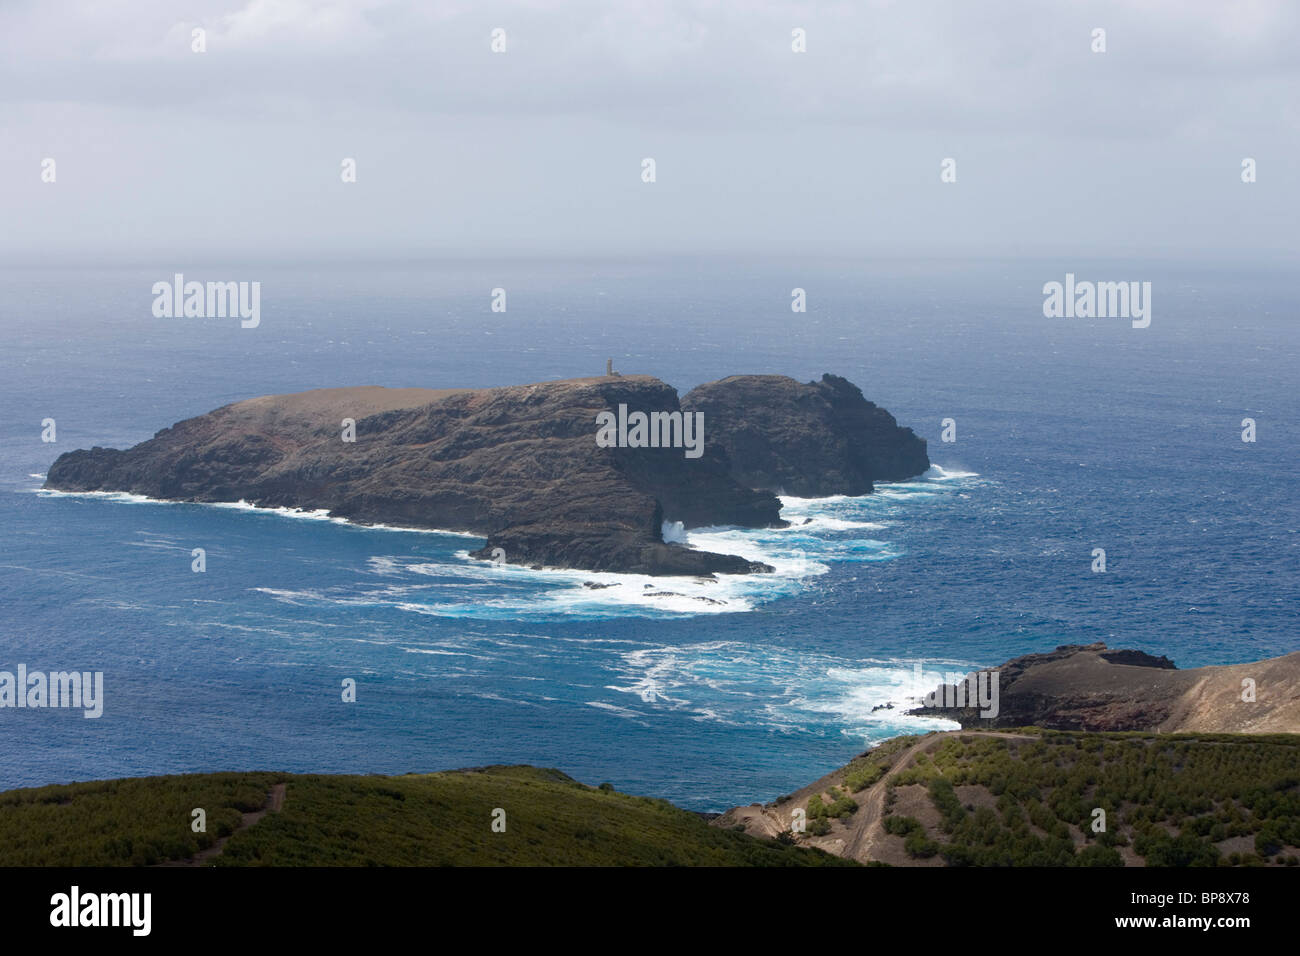 Ilheu de Ferro Island, Porto Santo, near Madeira, Portugal - Stock Image